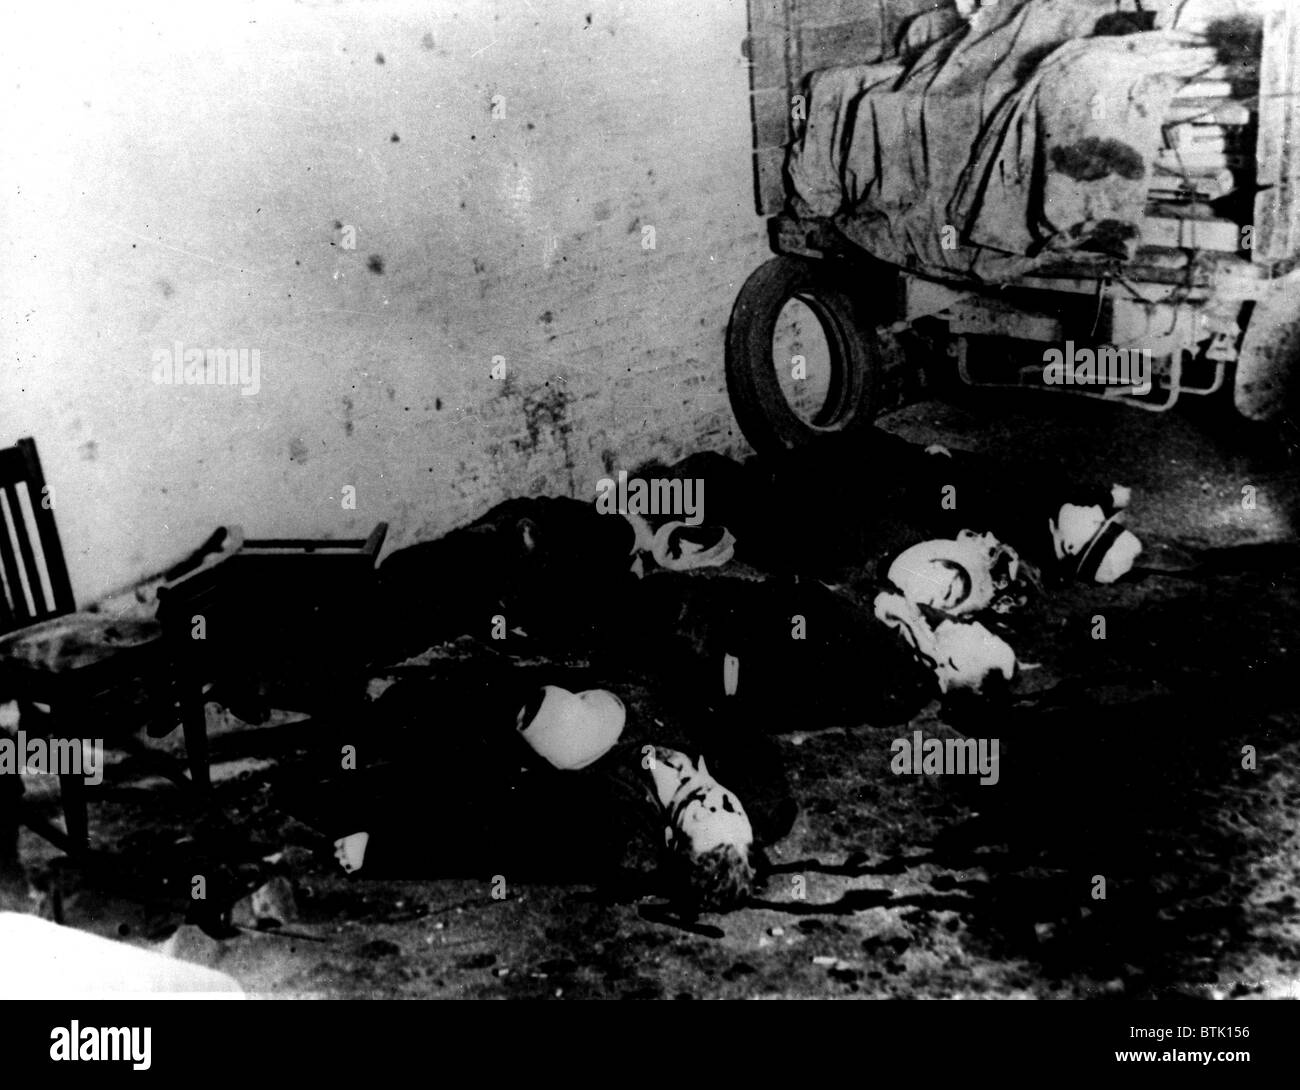 Valentinstag-Massaker, Chicago, 14. Februar 1929 Stockfoto, Bild ...